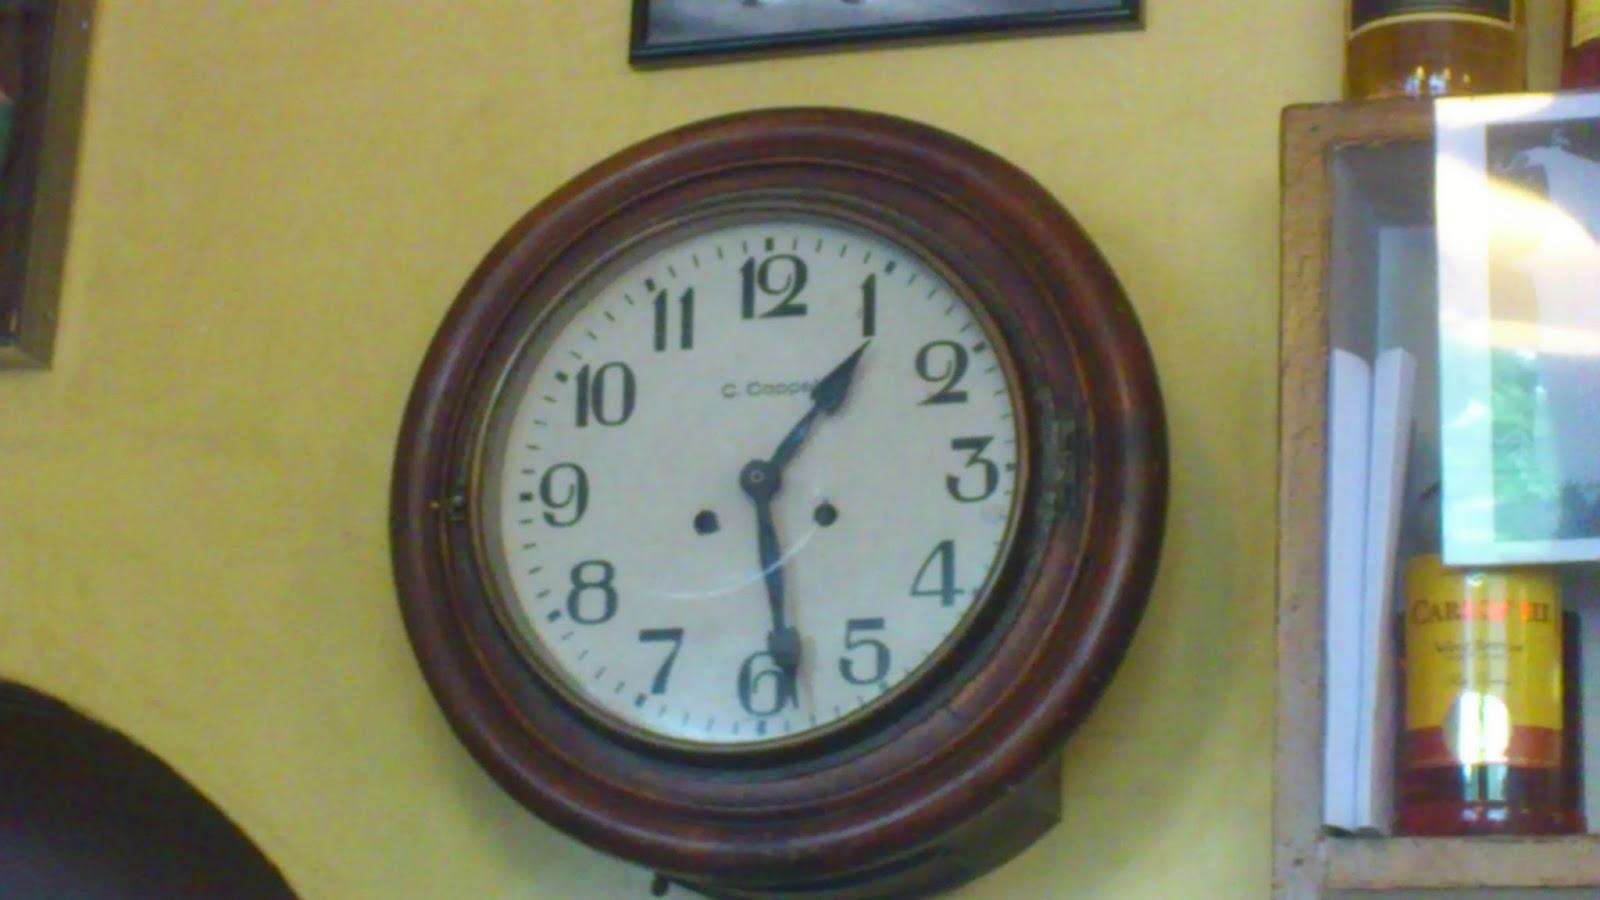 Madridmetropolis detalles de madrid la otra colecci n - Reloj pintado en la pared ...